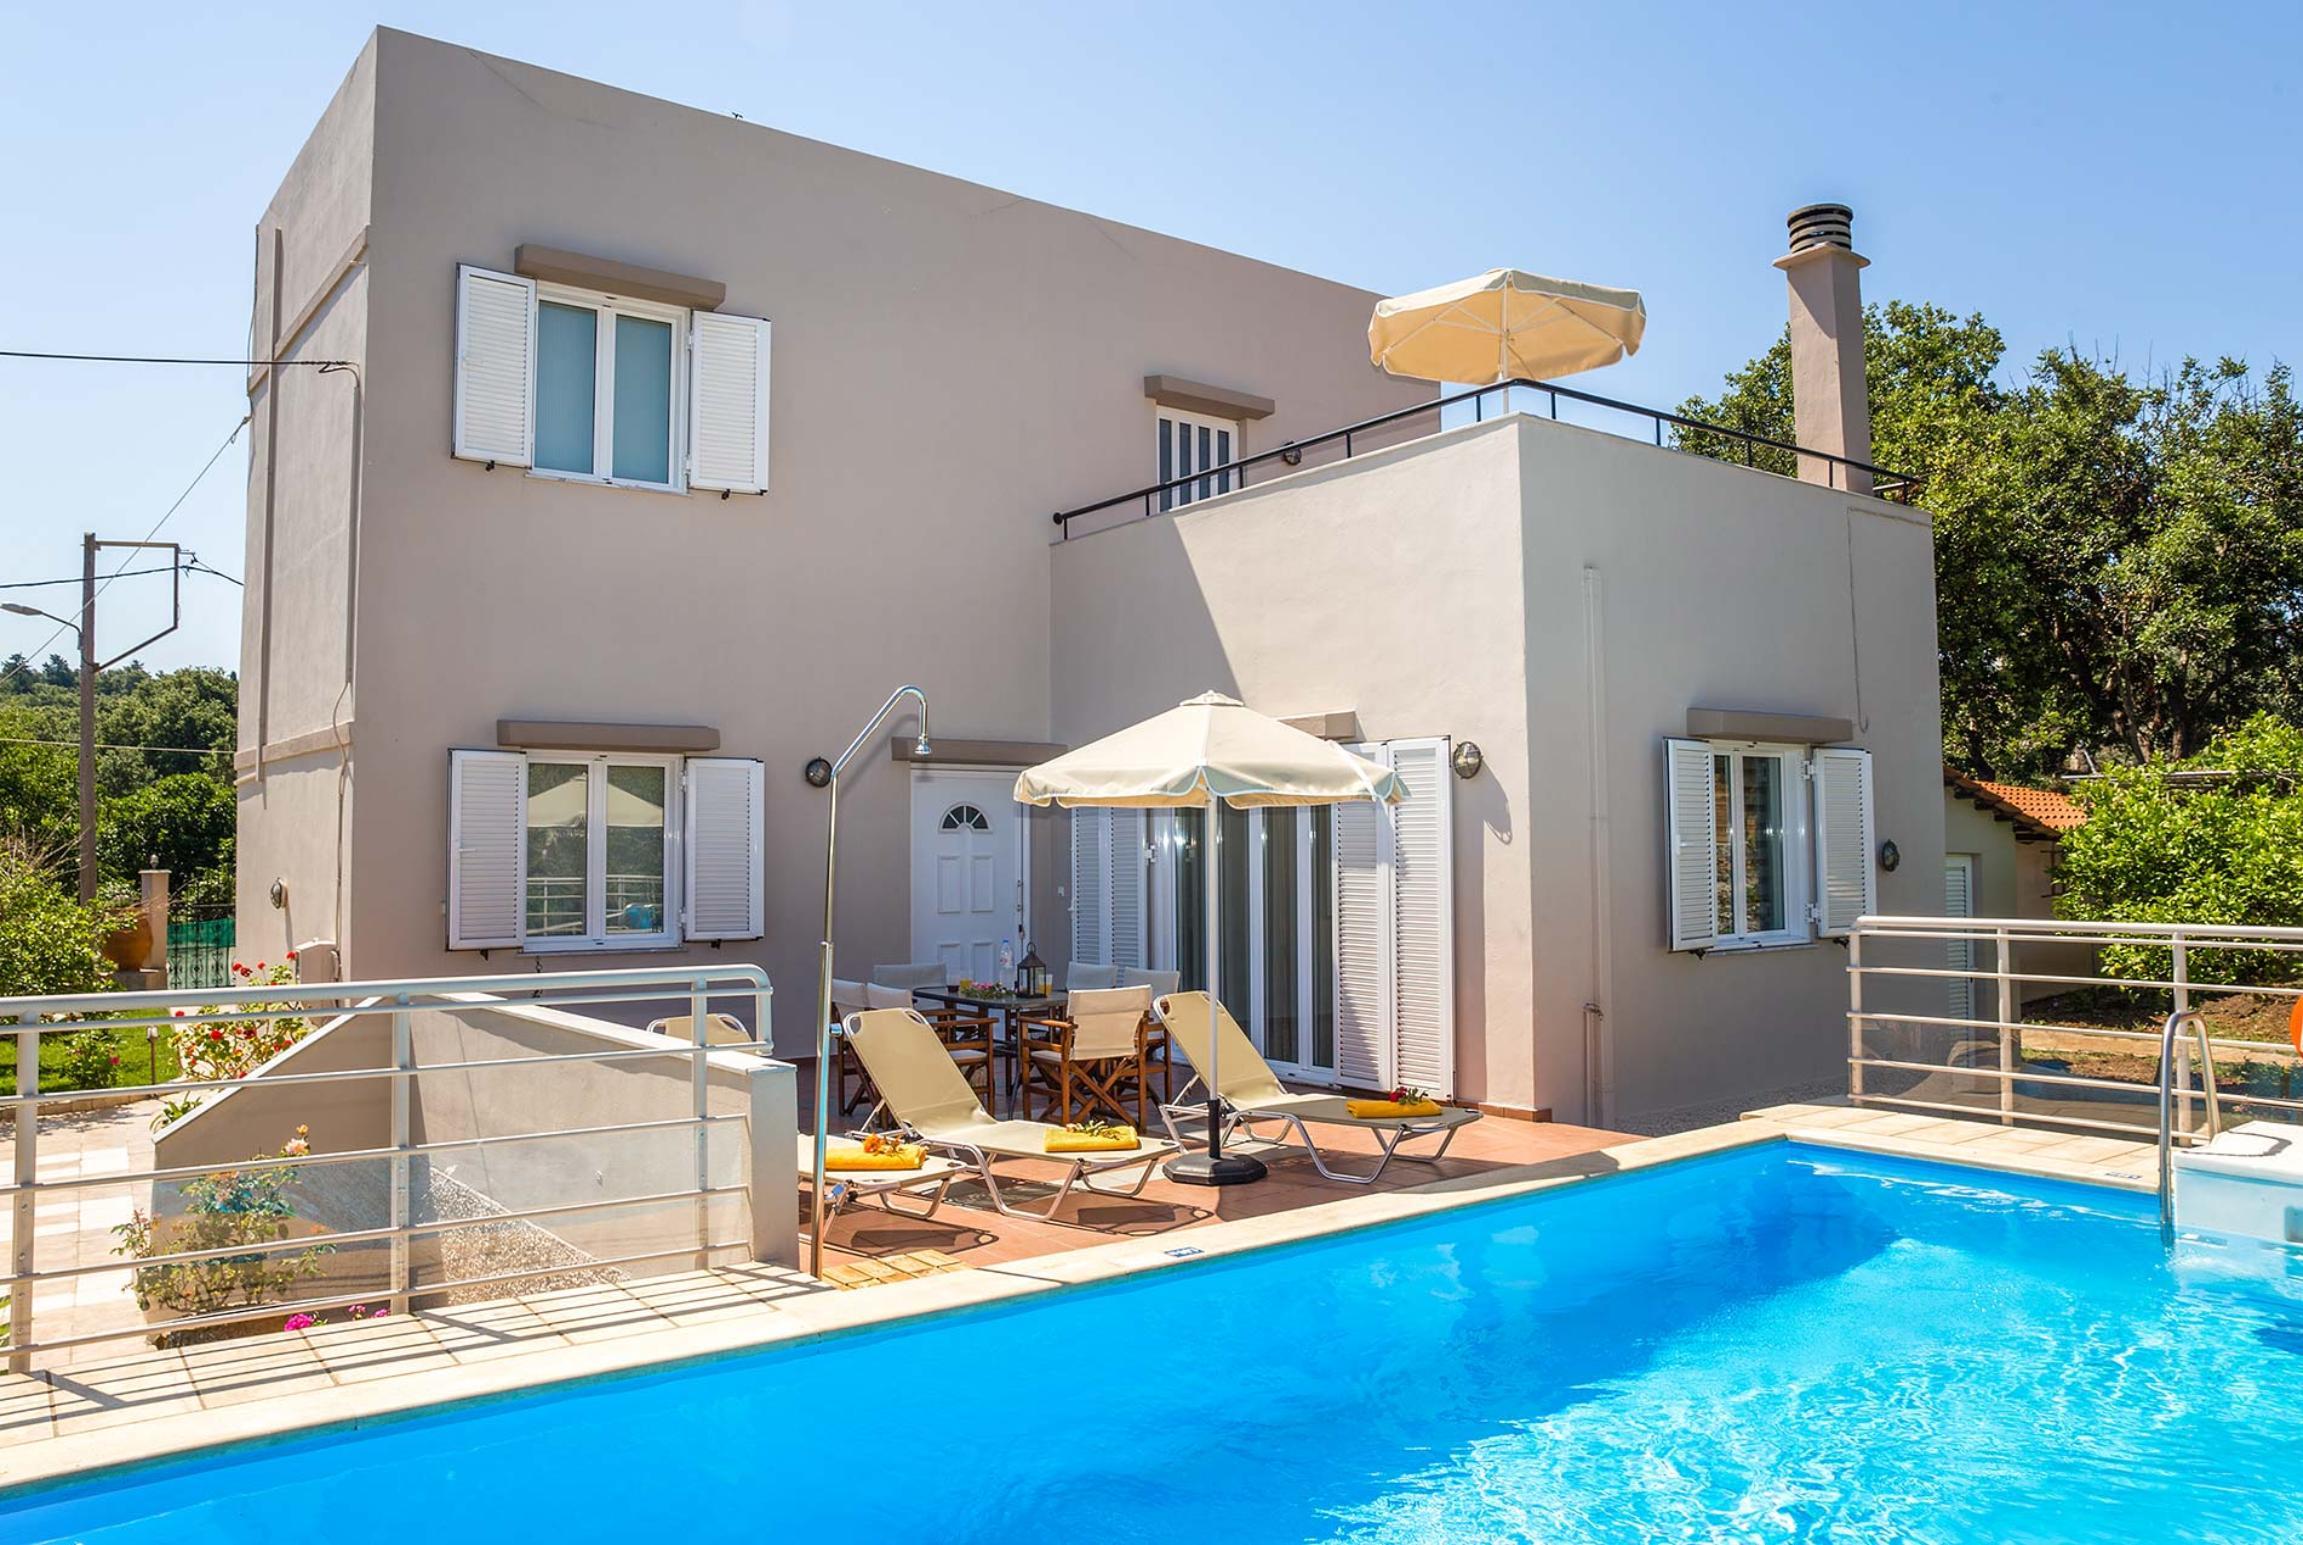 Ferienhaus Filia (2654231), Rethymno, Kreta Nordküste, Kreta, Griechenland, Bild 29